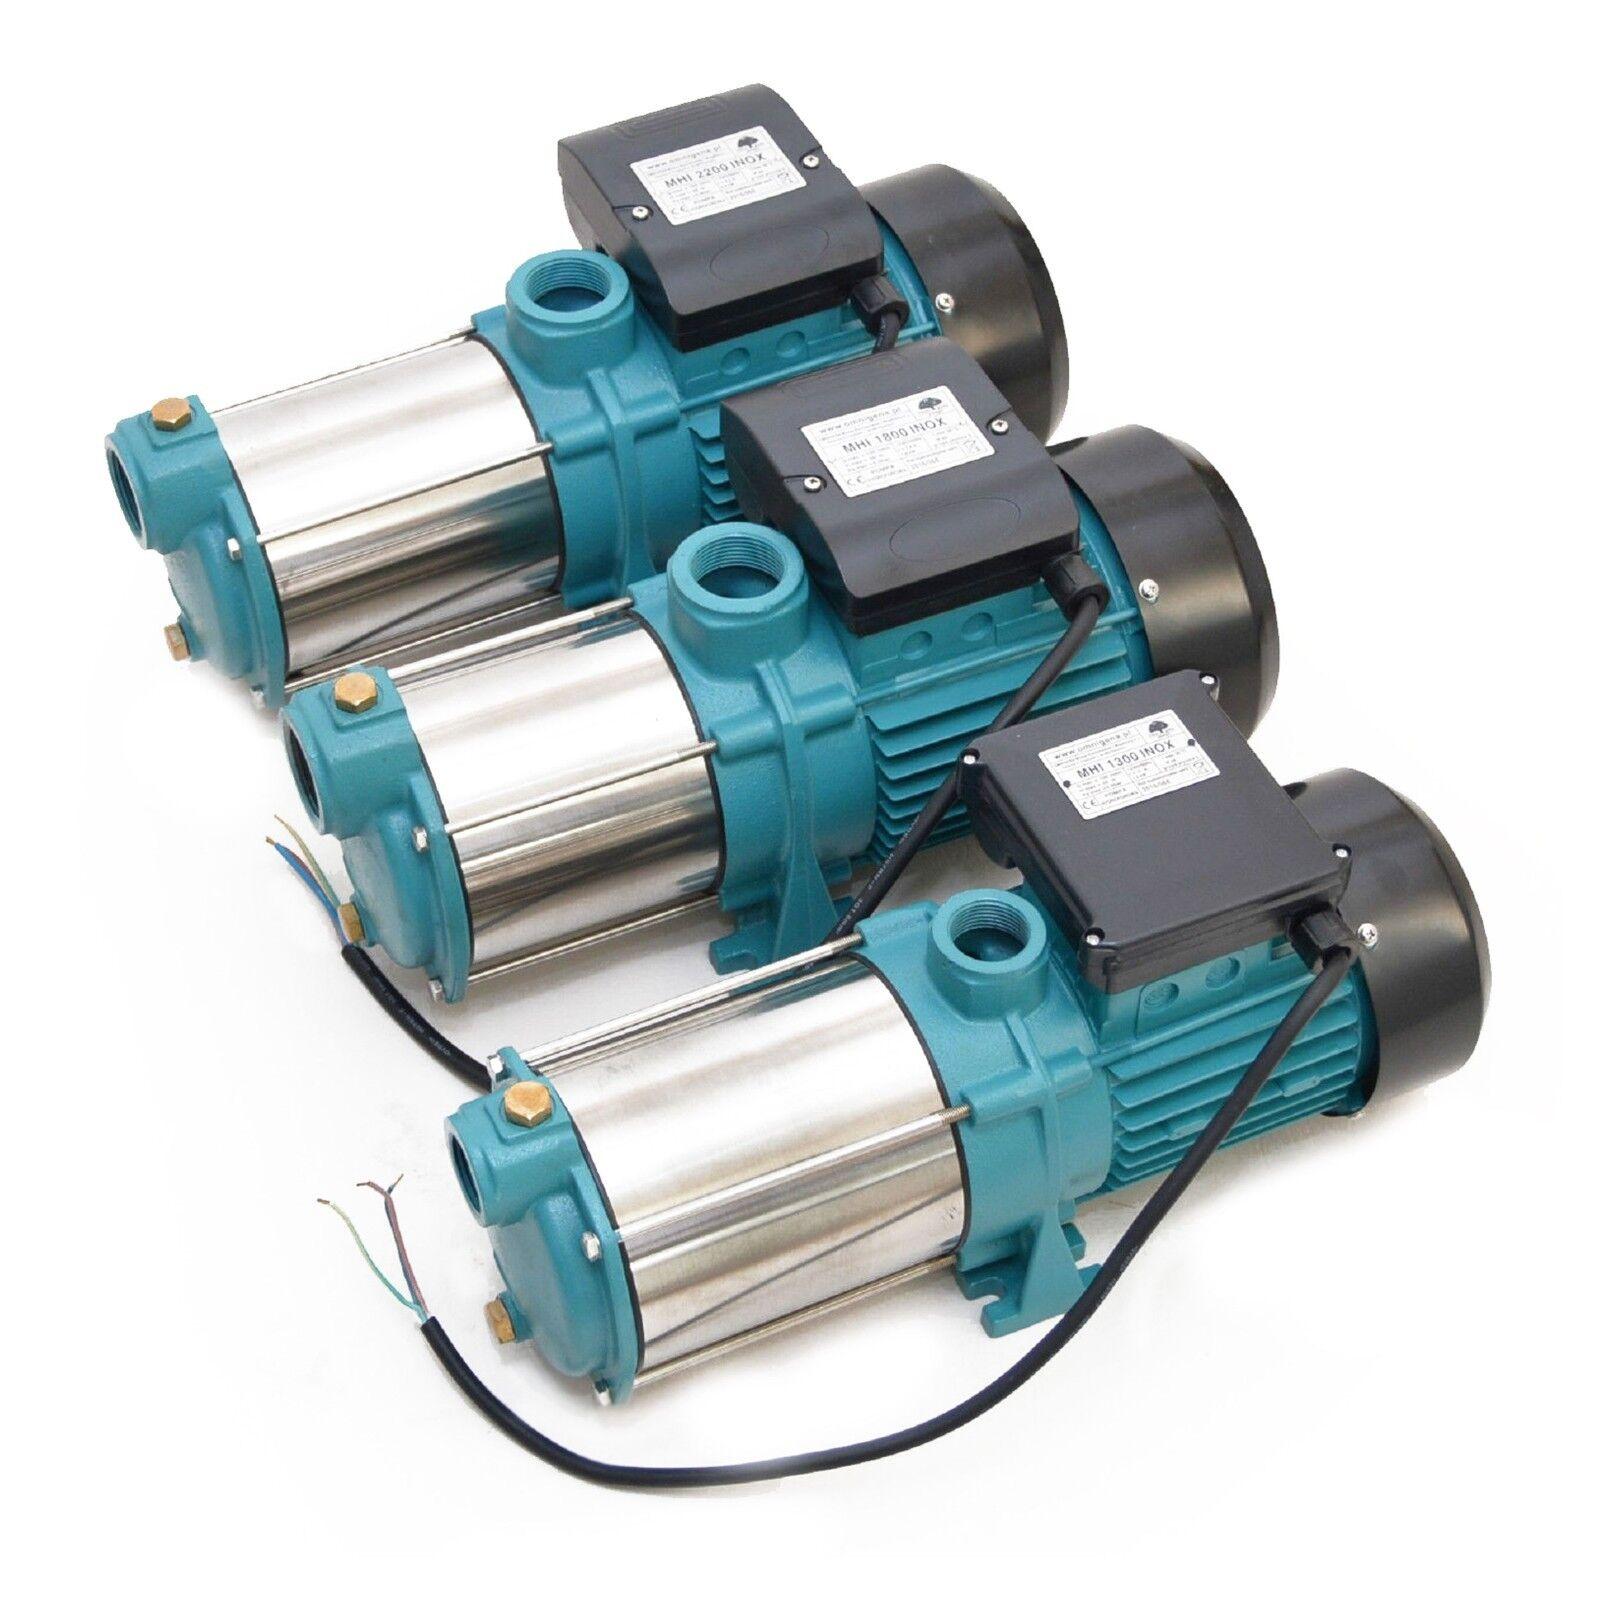 Gartenpumpe Kreiselpumpe 1300W 1800W 2200W INOX 230V, 6000-9600 l/h 5,5-5,8 bar